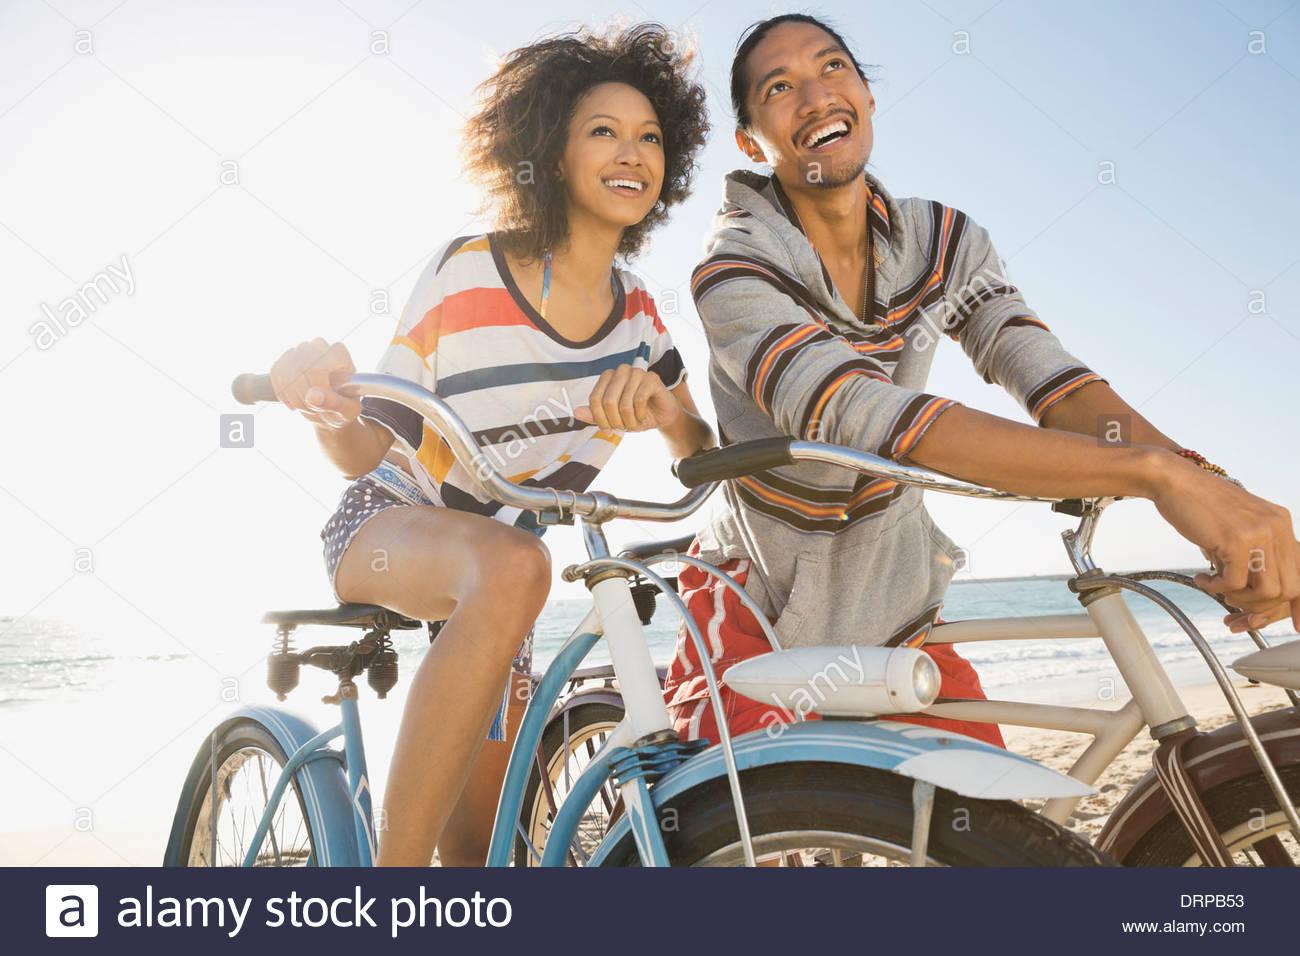 Paar mit Fahrrädern am Strand Stockbild